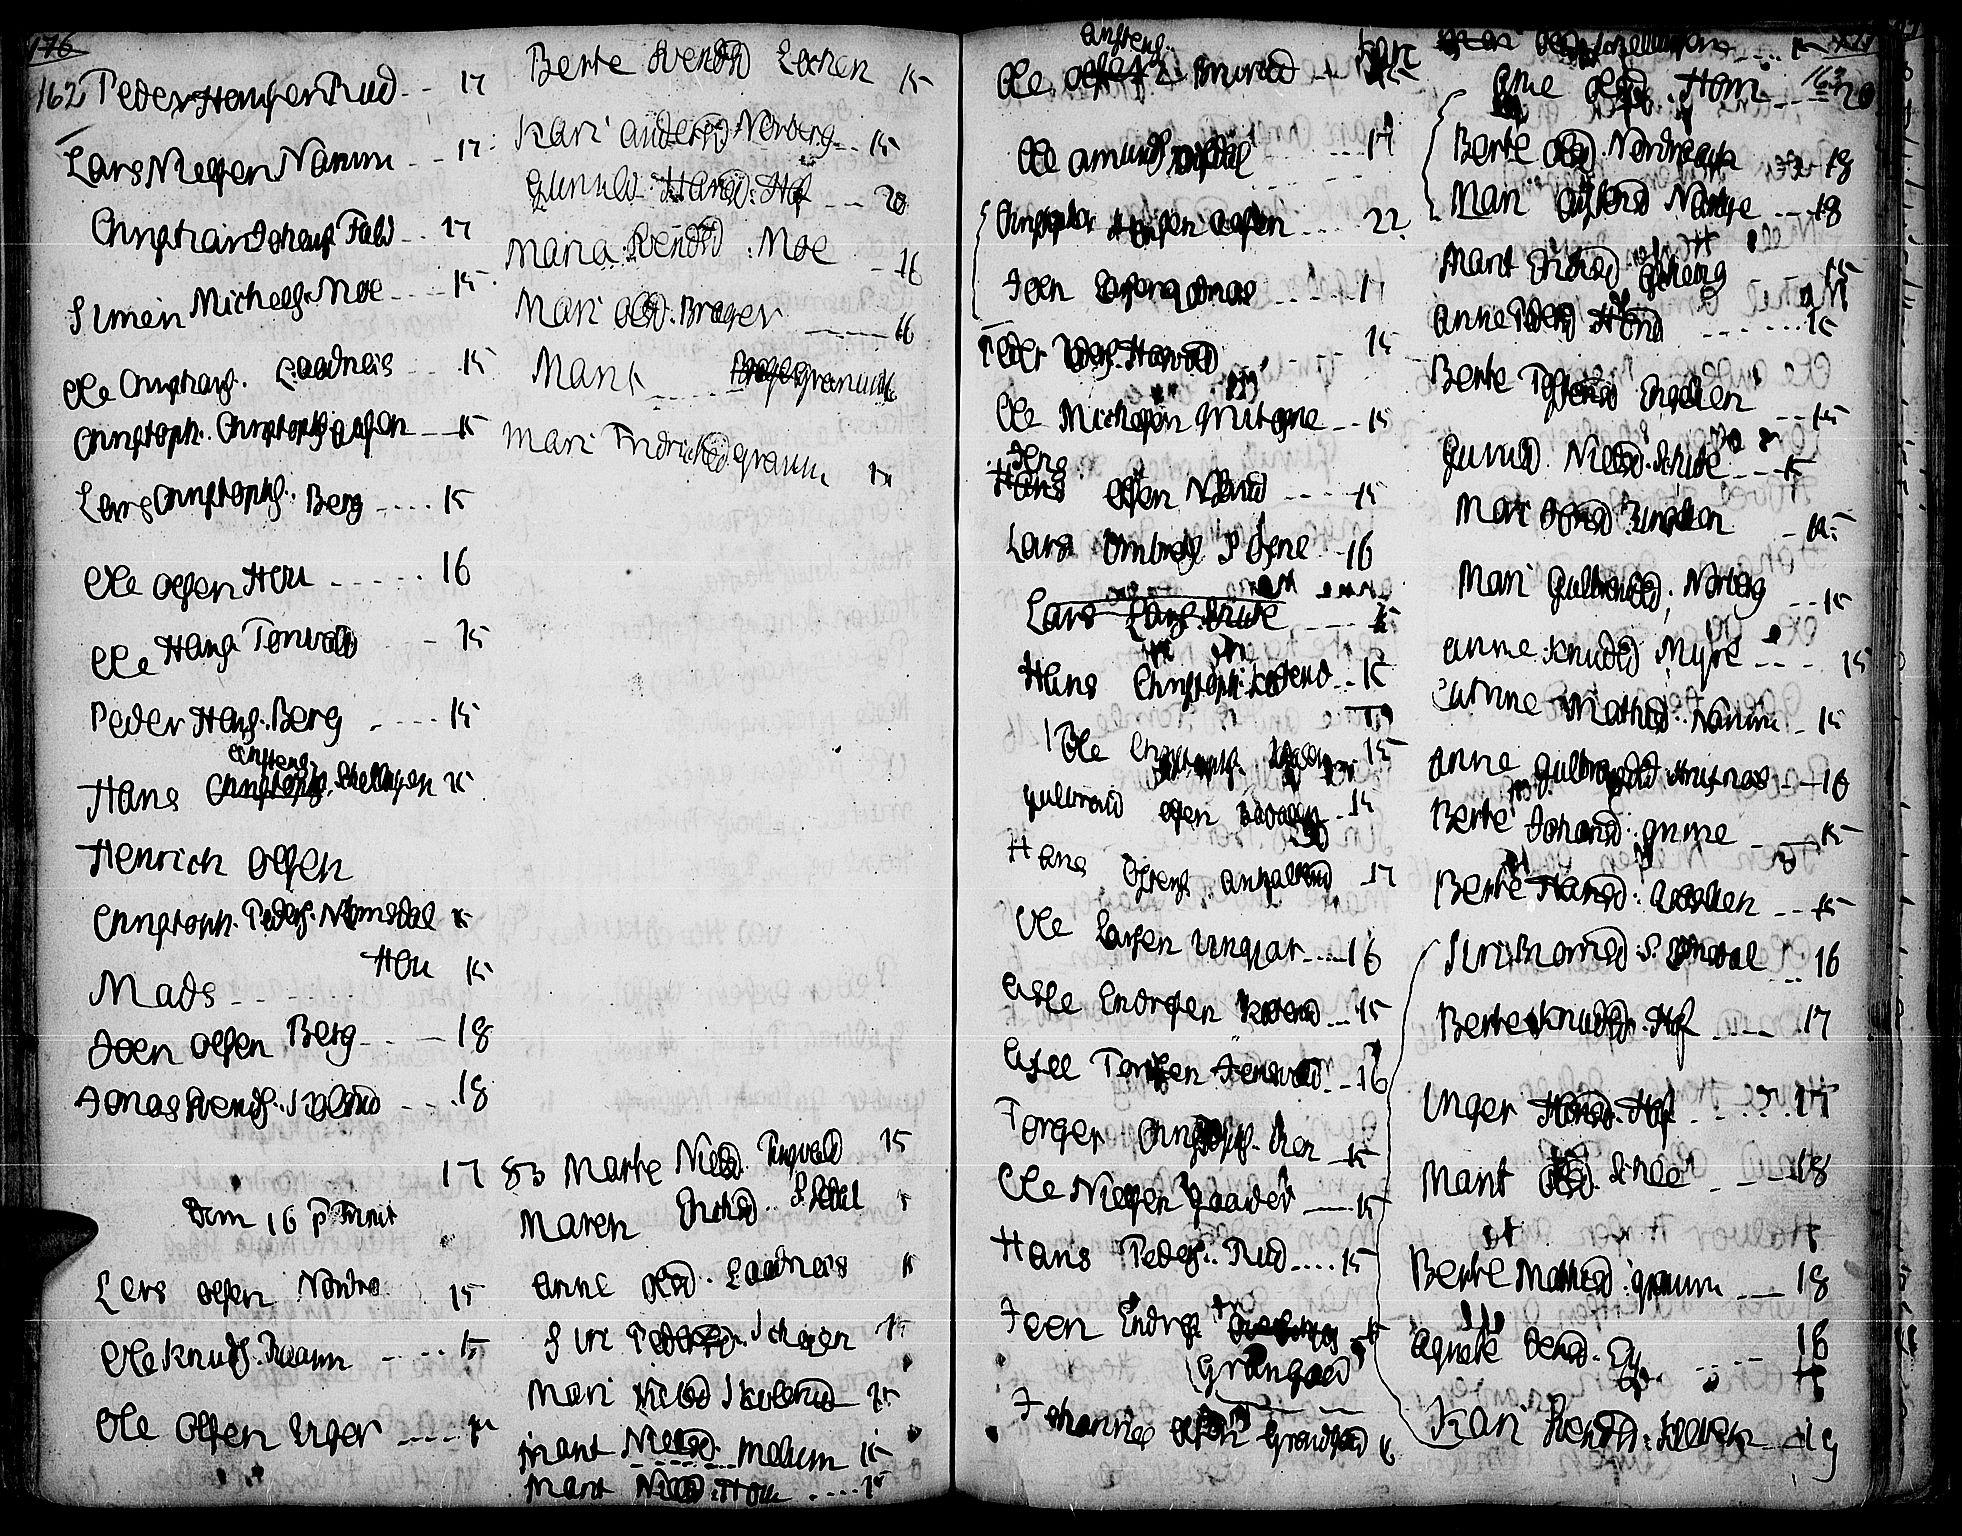 SAH, Land prestekontor, Ministerialbok nr. 5, 1765-1784, s. 162-163